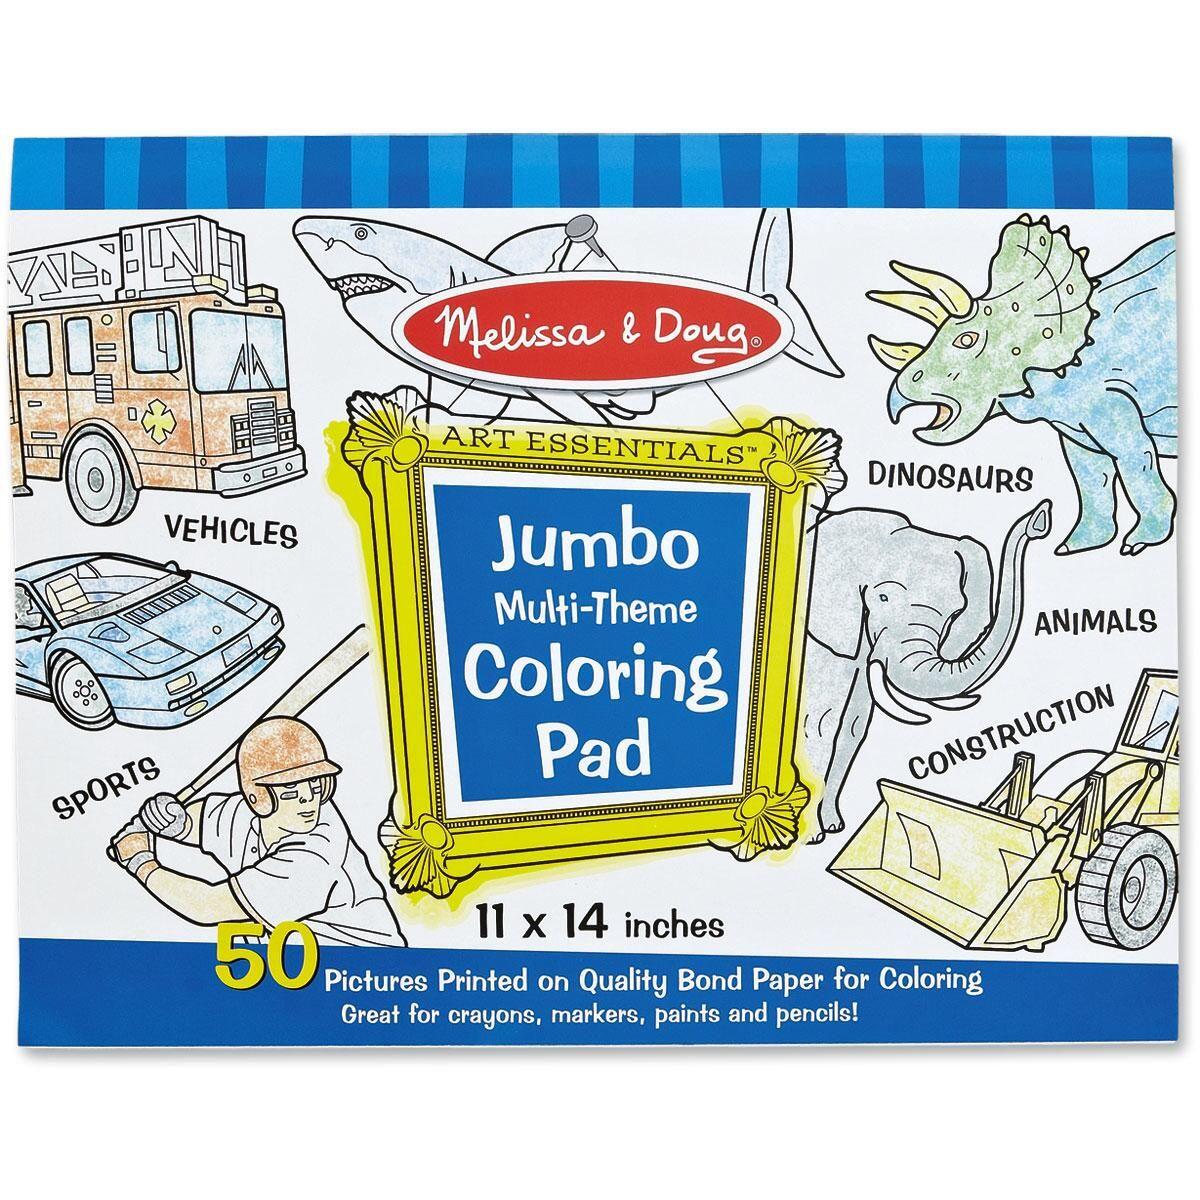 Blue Jumbo Coloring Pad by Melissa & Doug®